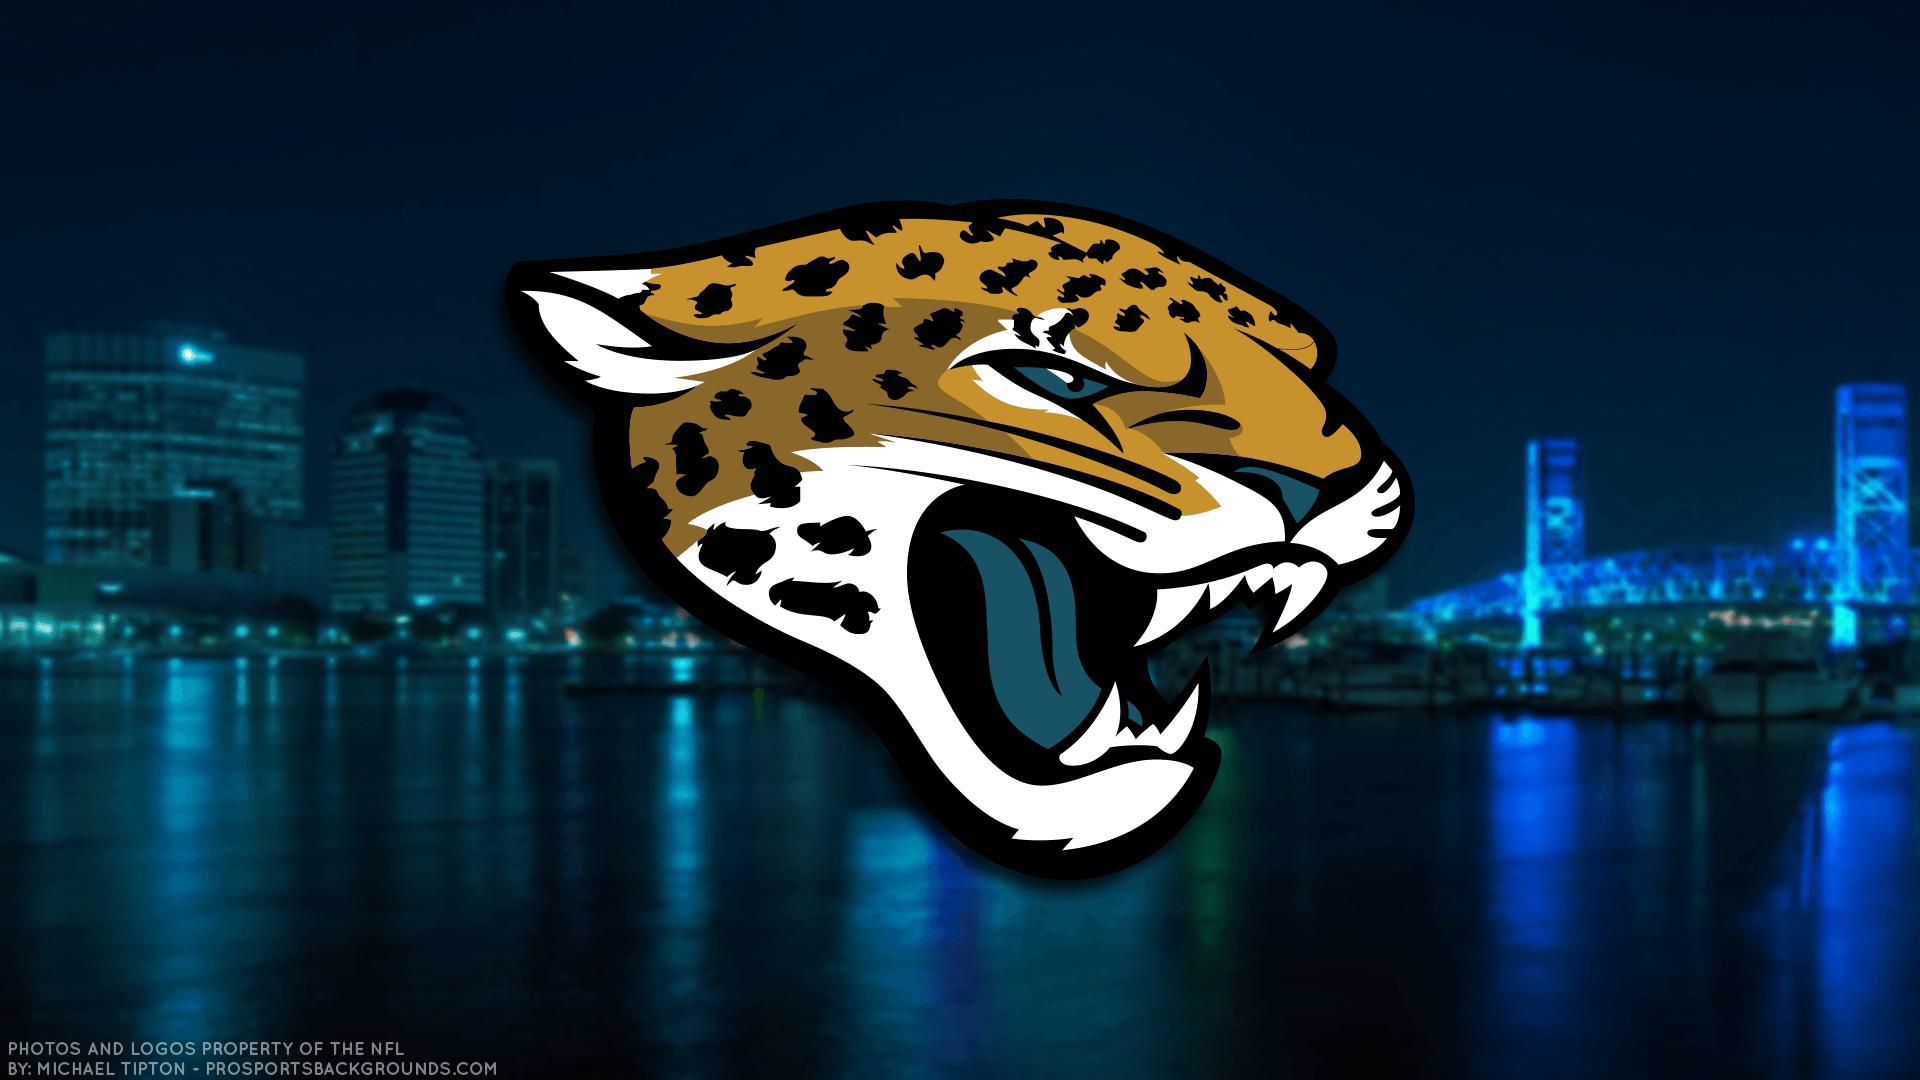 Jacksonville Jaguars Wallpapers - Wallpaper Cave